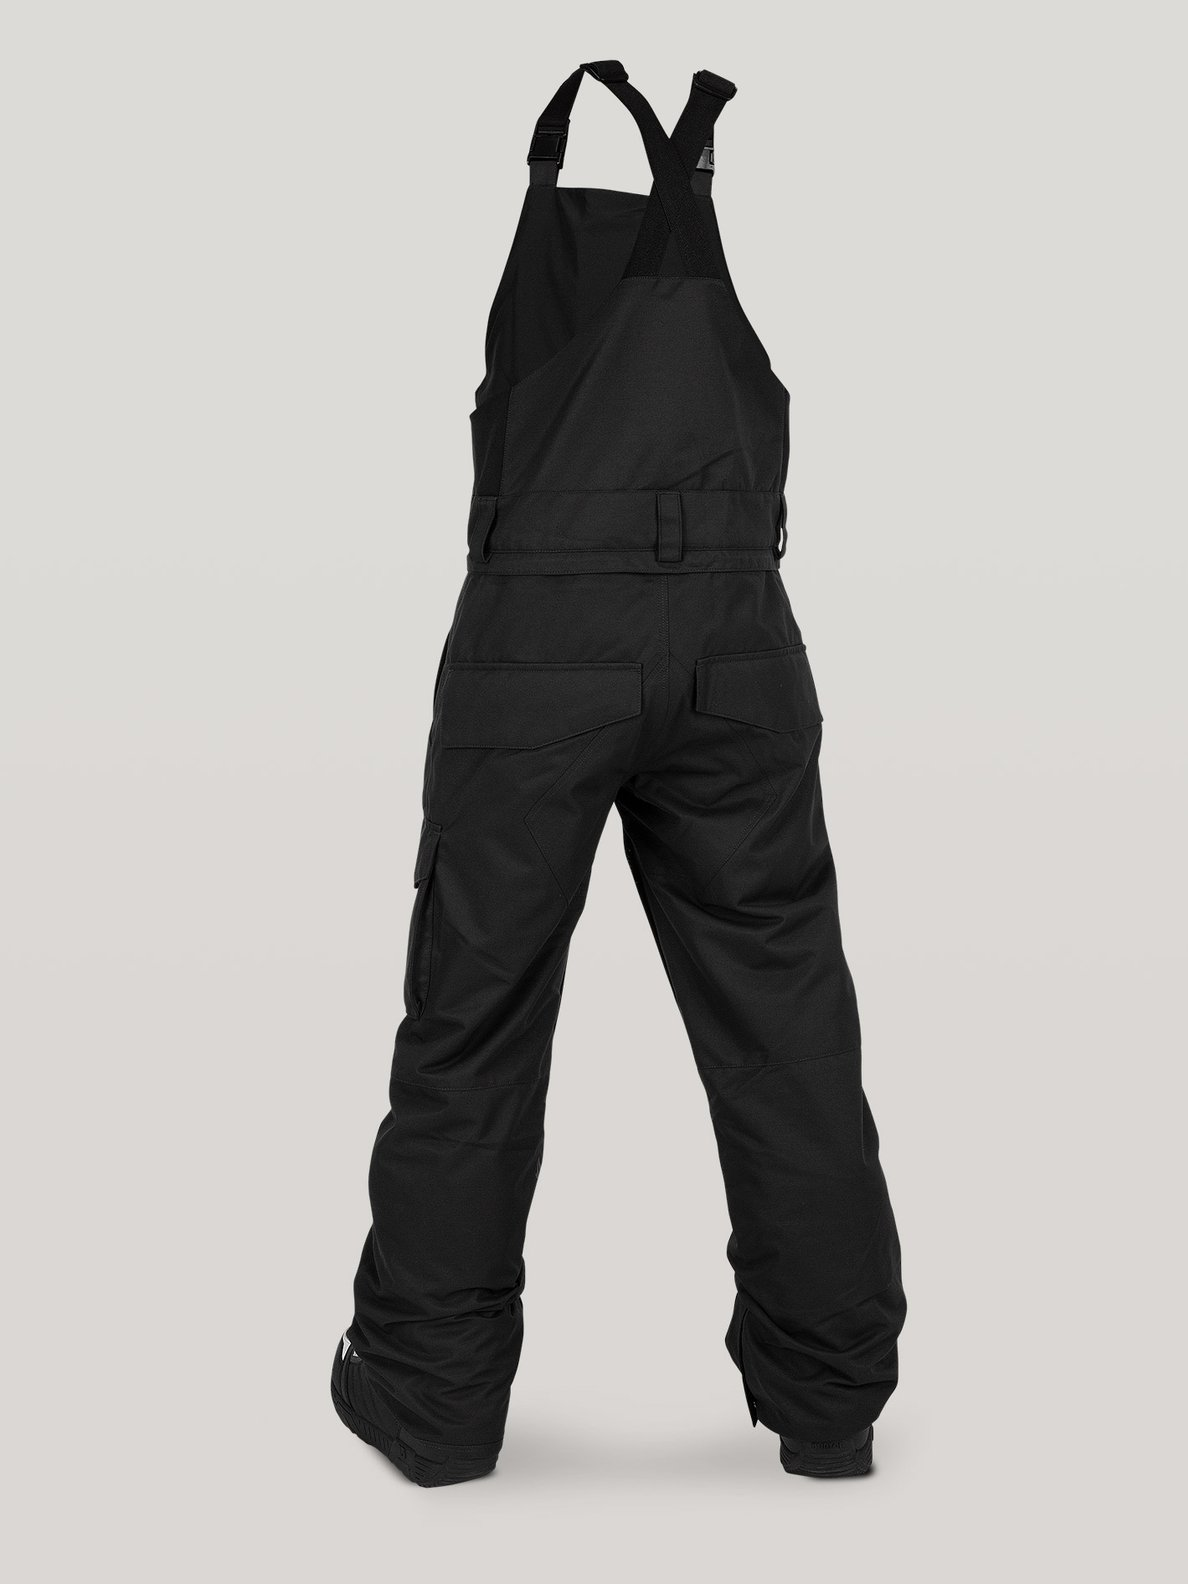 Volcom Barkely BIB overall black